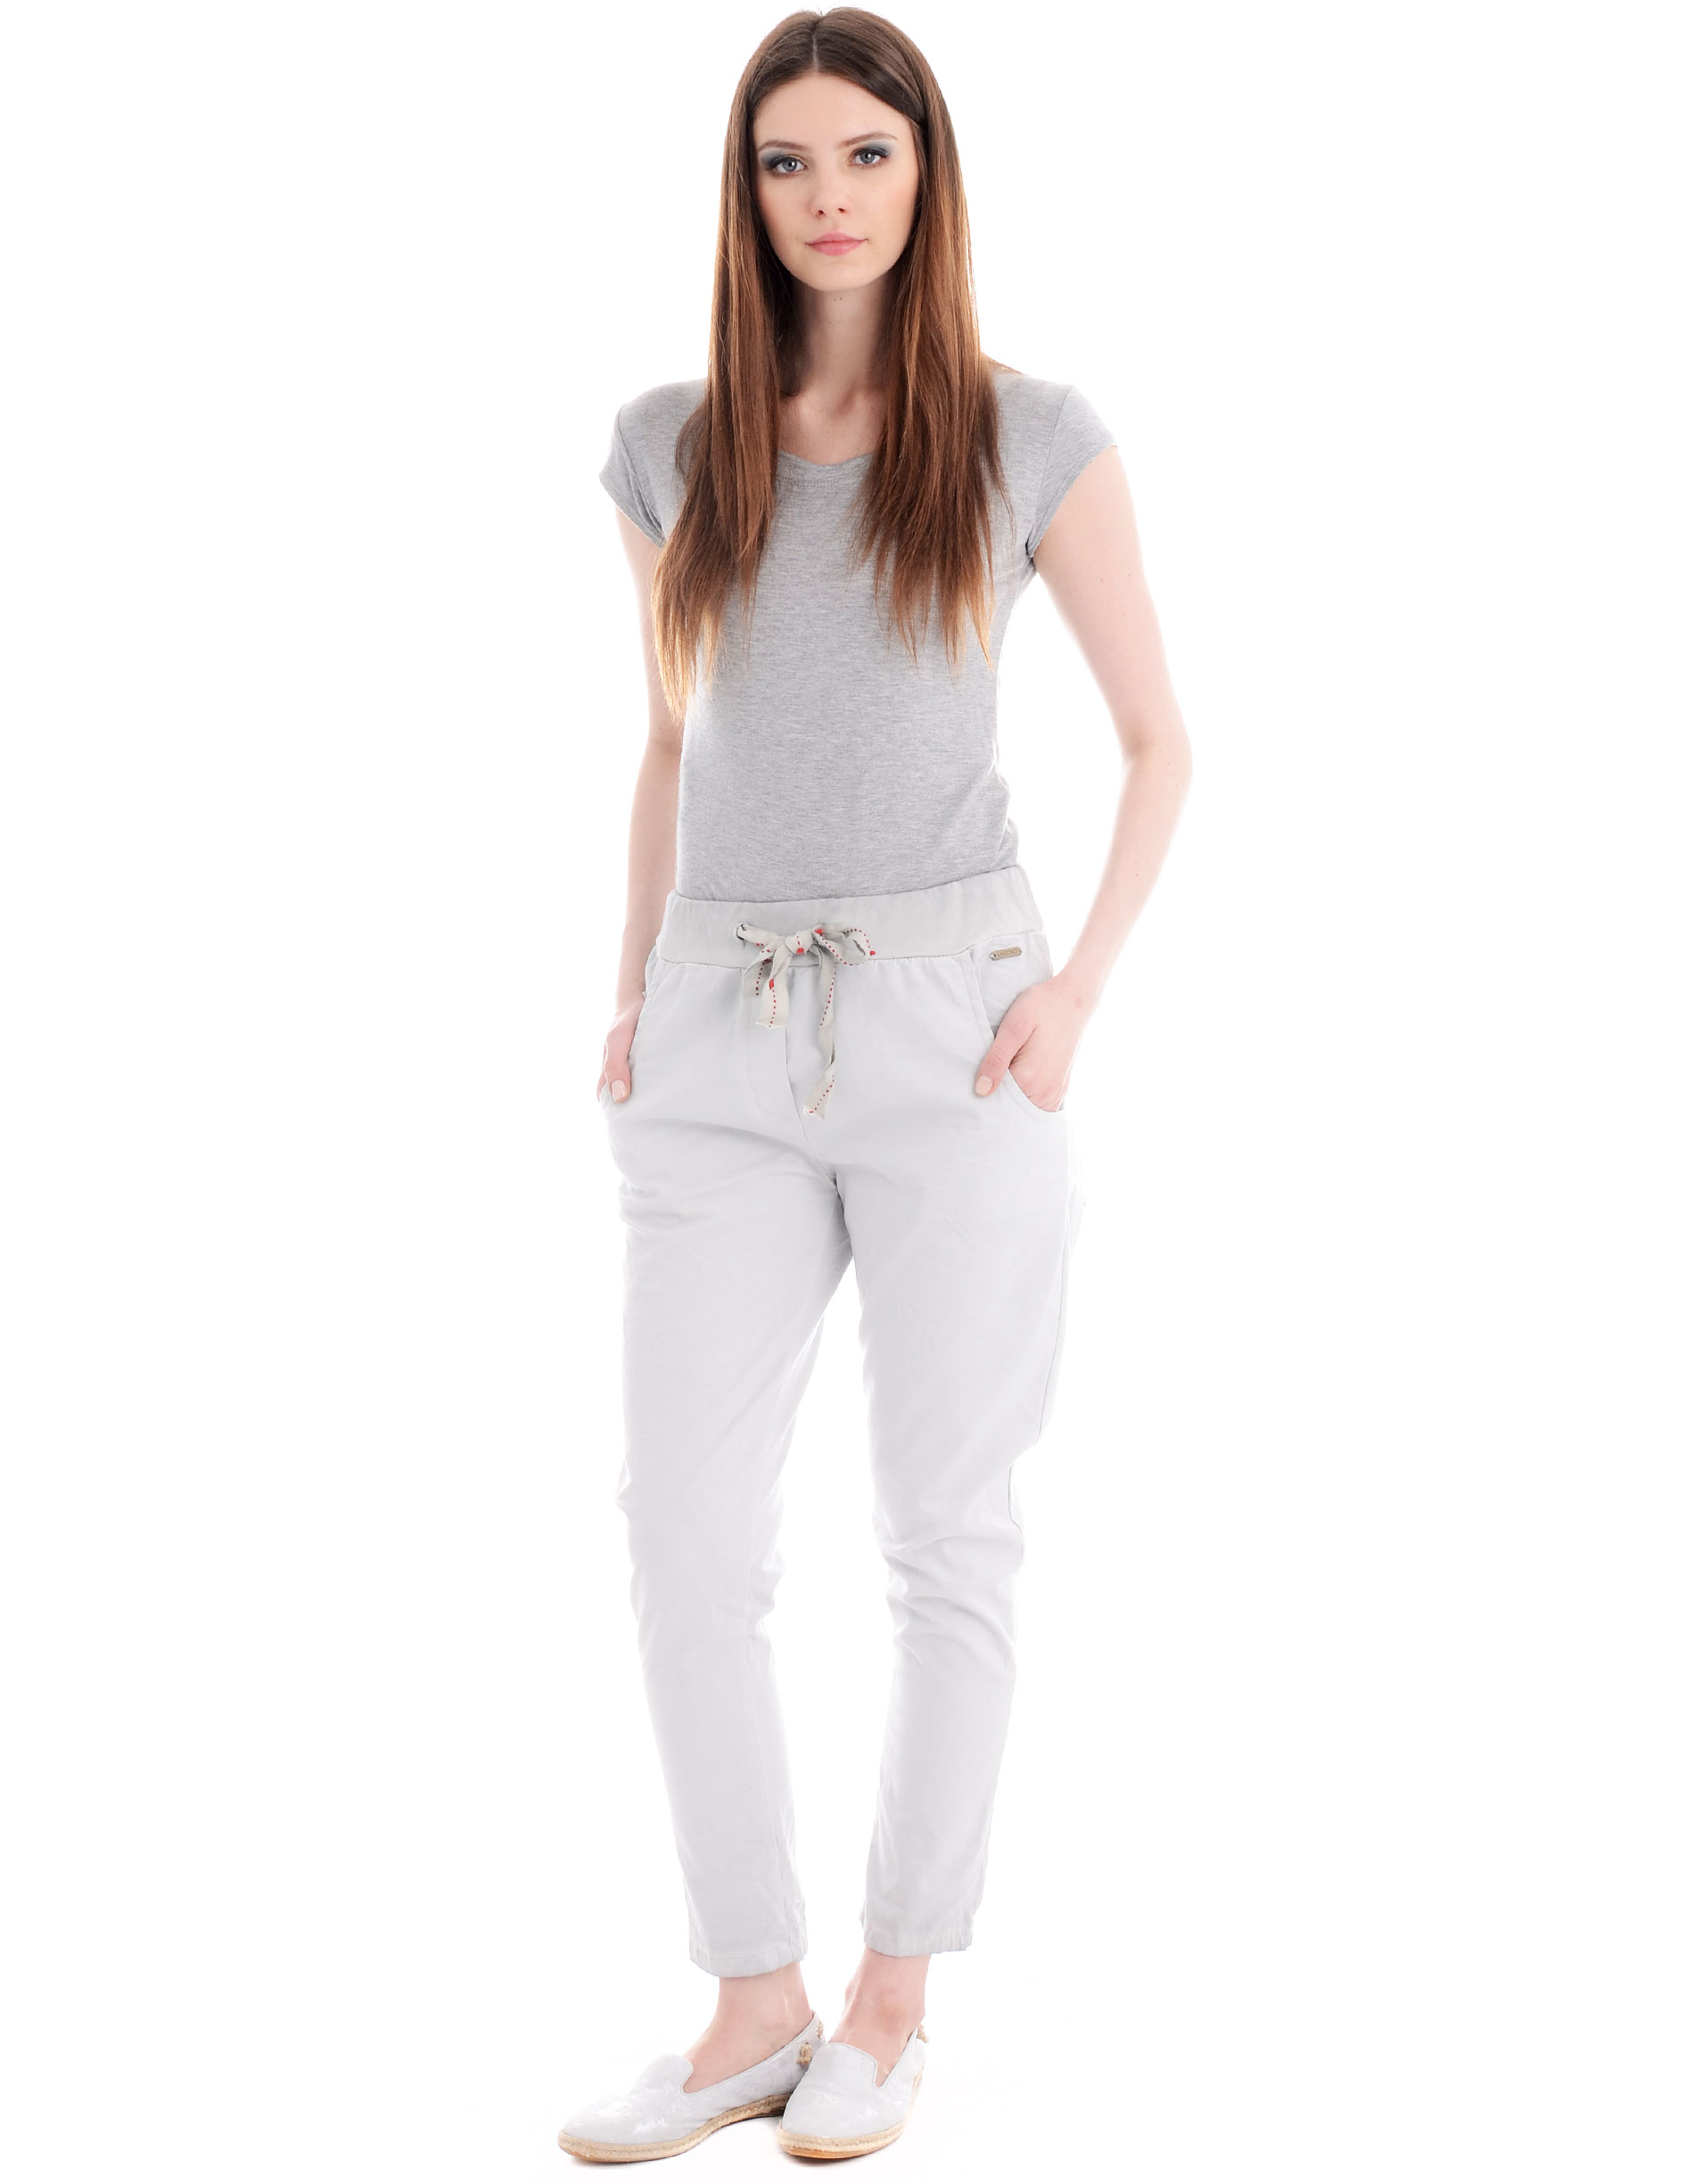 Spodnie - 104-1216A GRI - Unisono